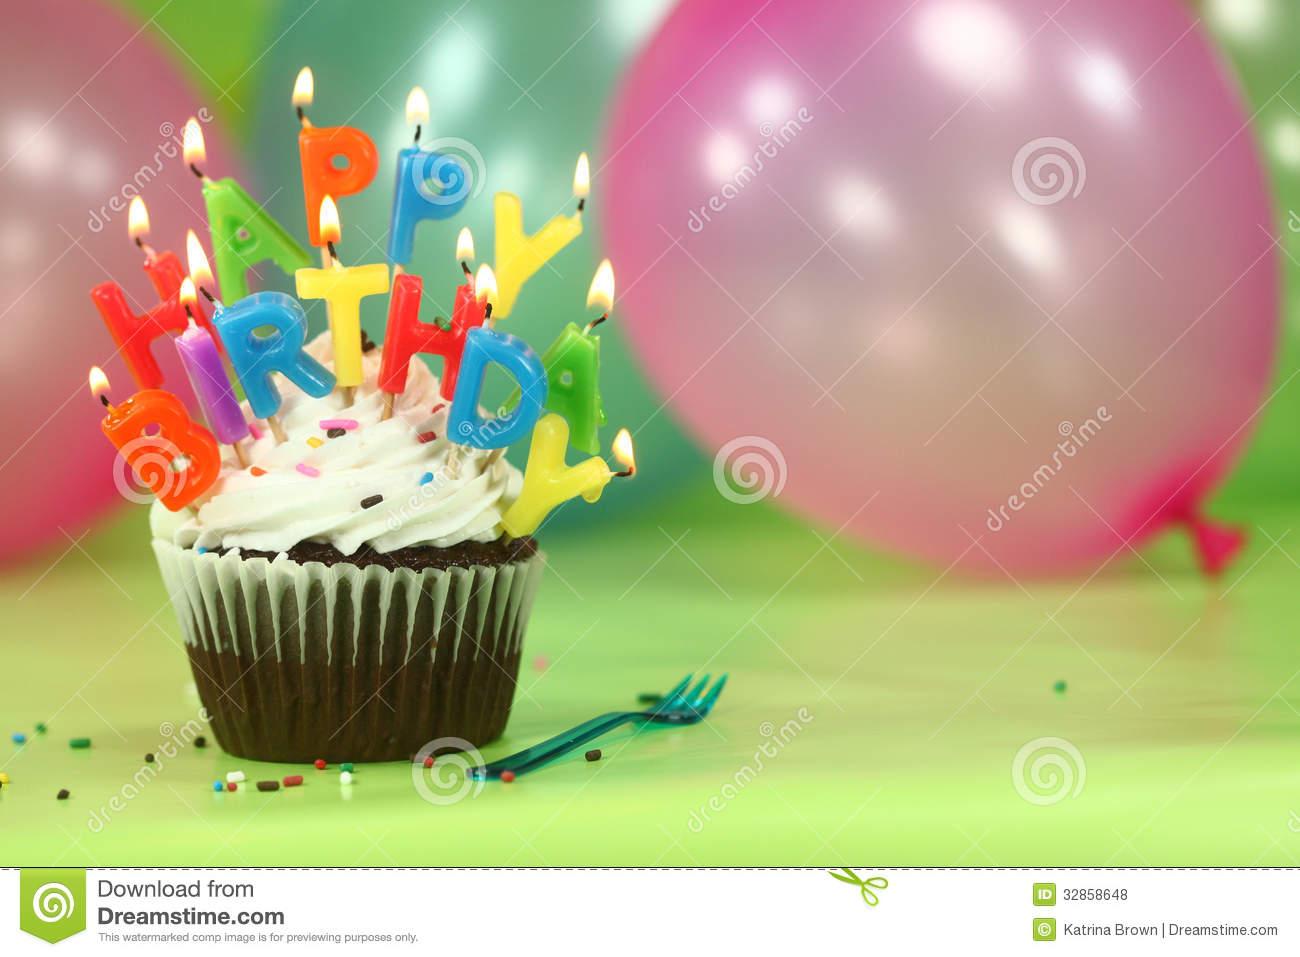 7 Pic Of Happy B Day Cakes And Ballouns Photo Happy Birthday